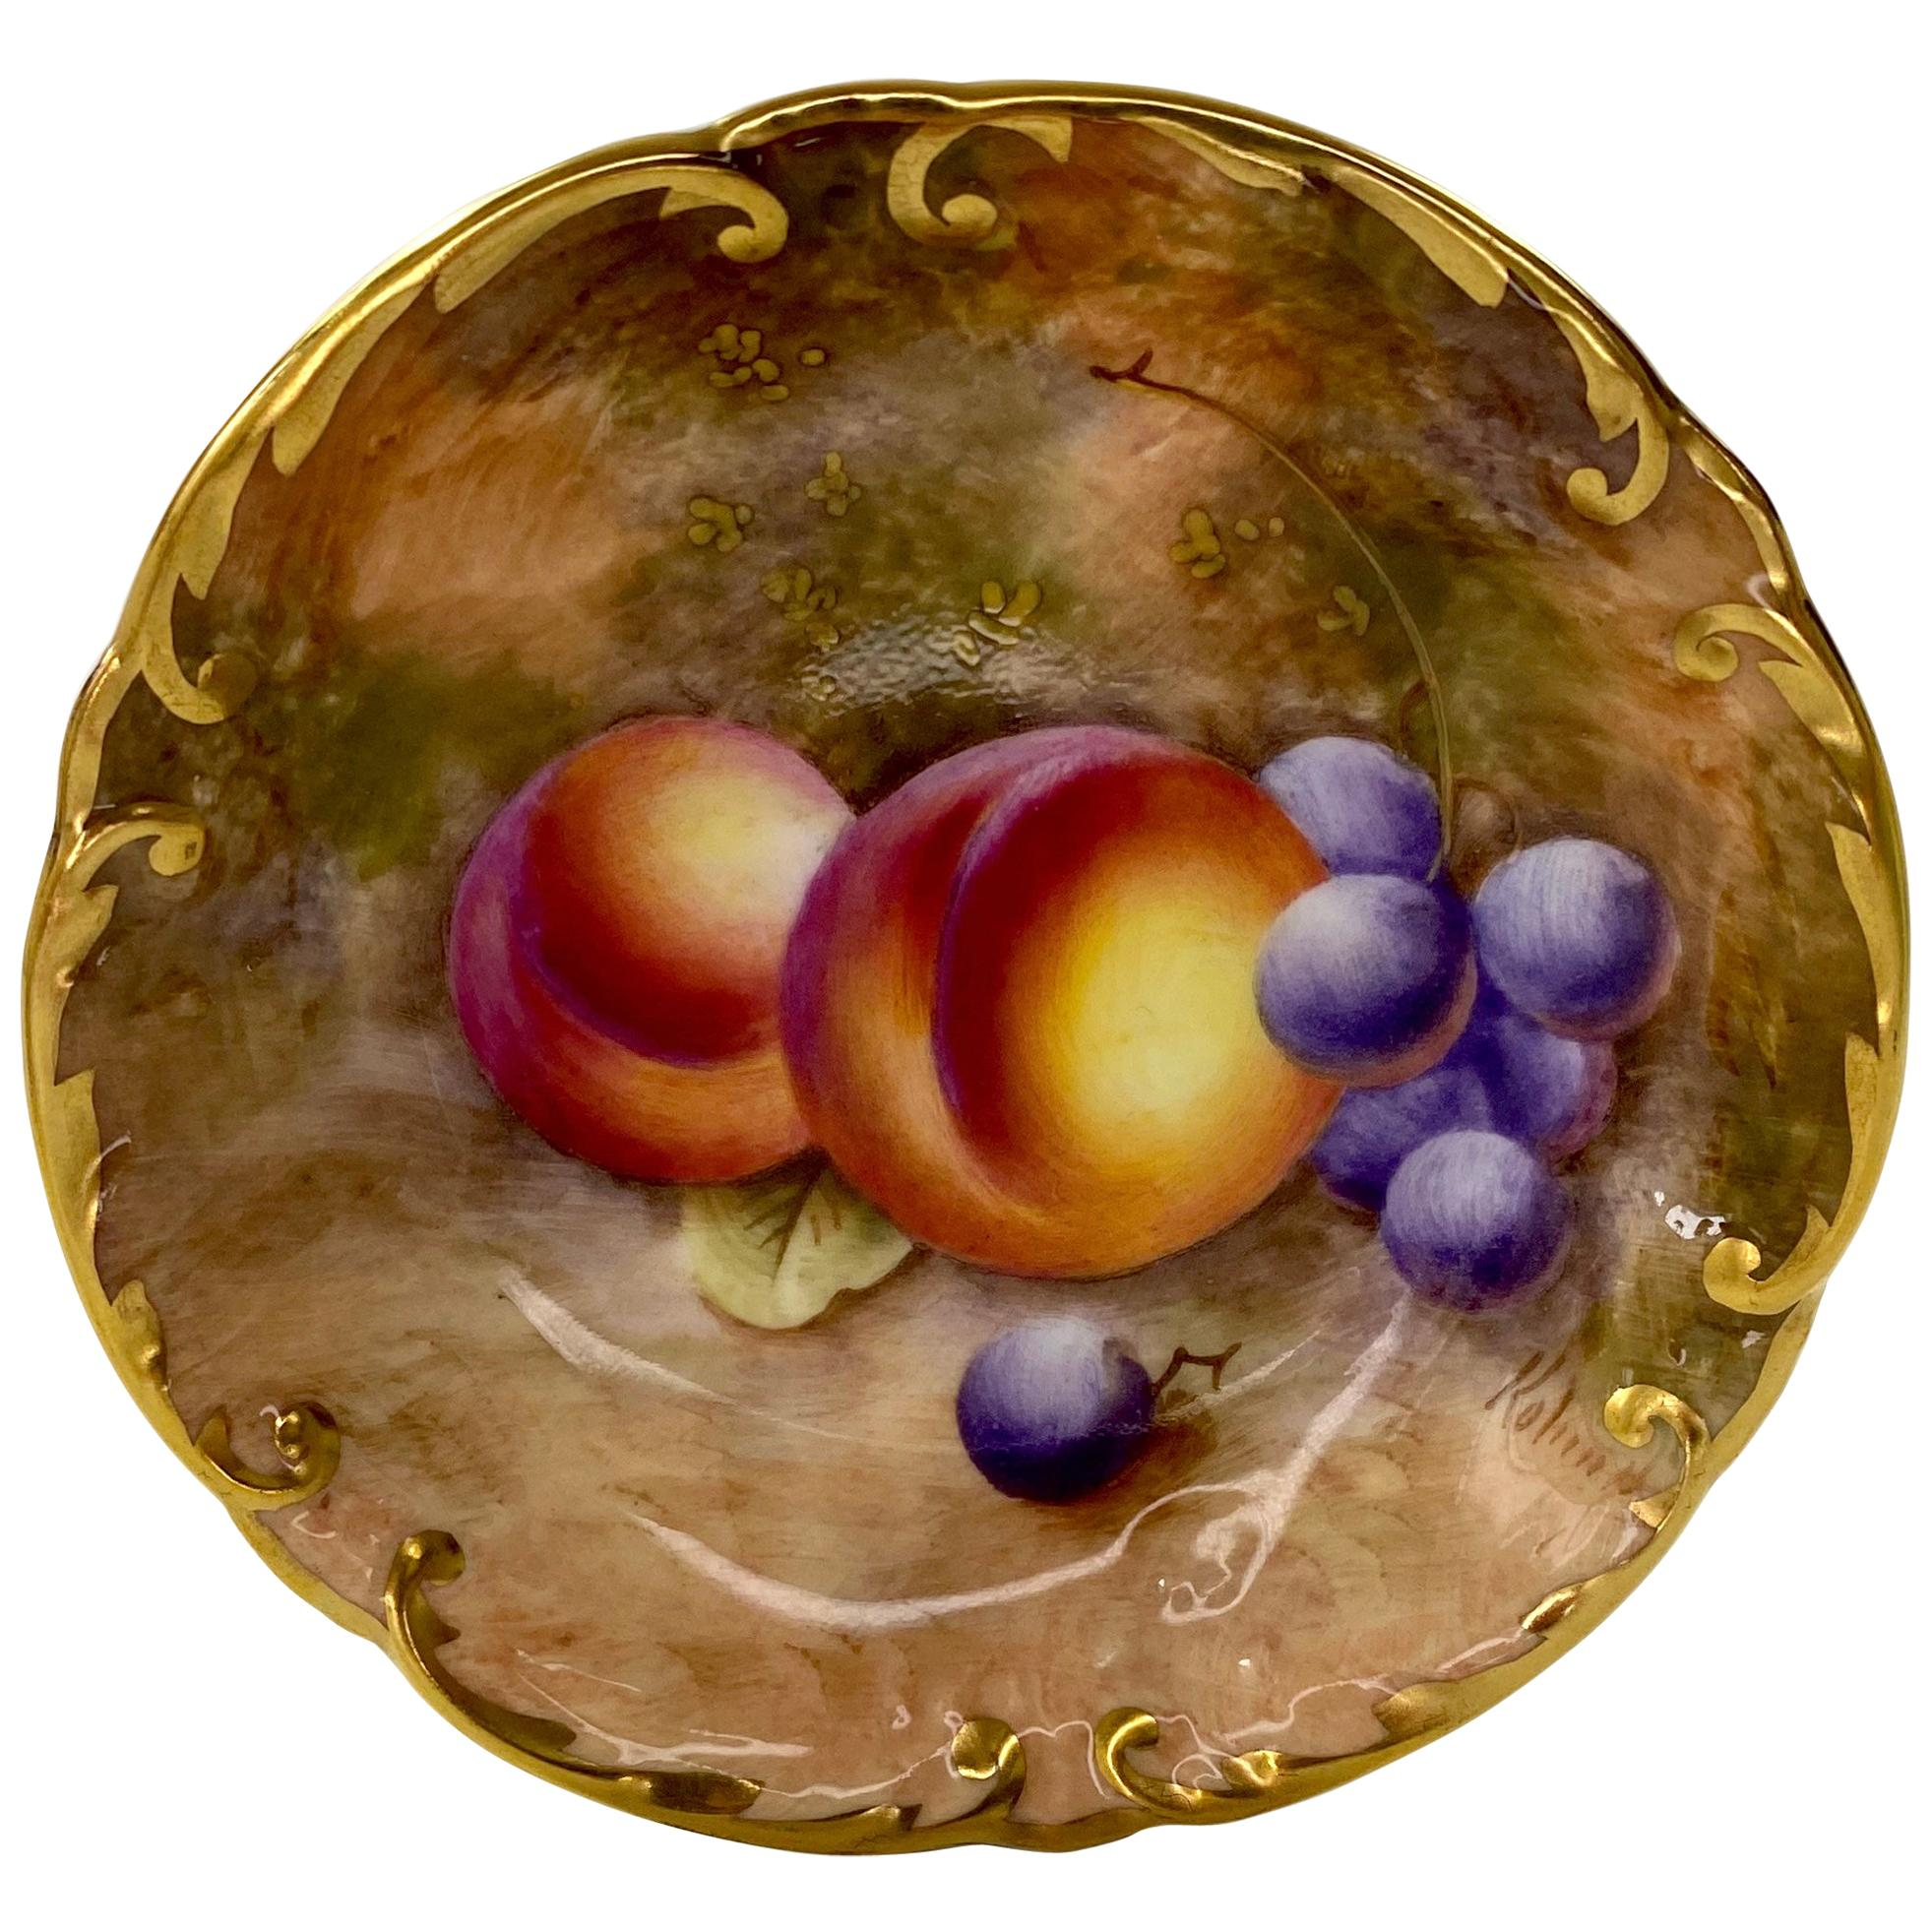 Royal Worcester Porcelain Fruit Pin Tray, William Roberts, d. 1952